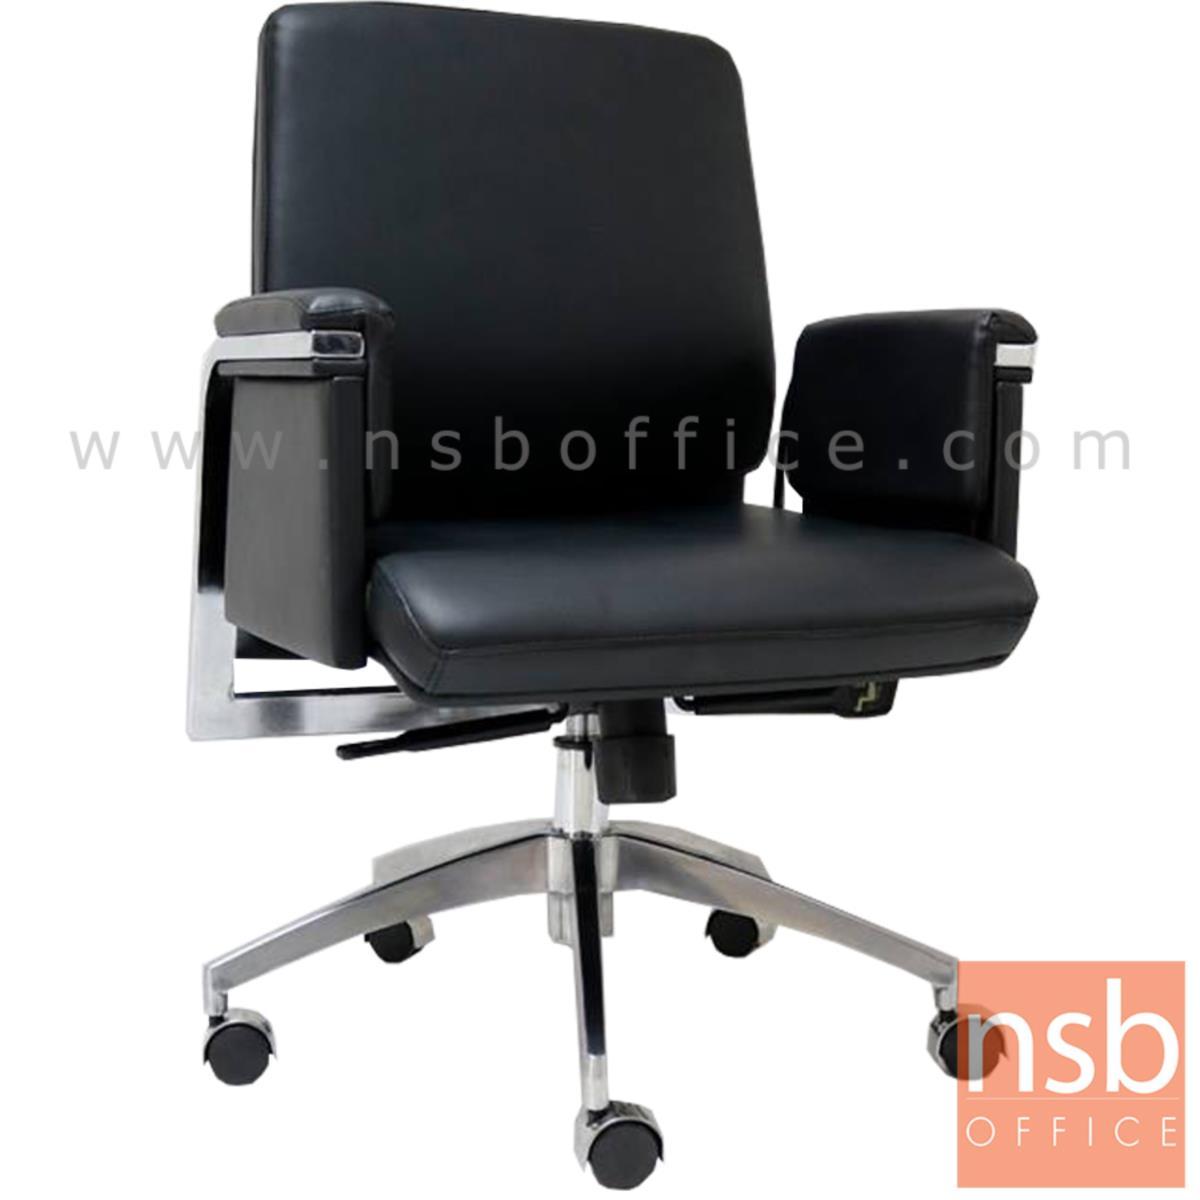 B03A302:เก้าอี้สำนักงาน รุ่น Levesque (เลเวสก์)  โช๊คแก๊ส มีก้อนโยก ขาเหล็กชุบโครเมี่ยม